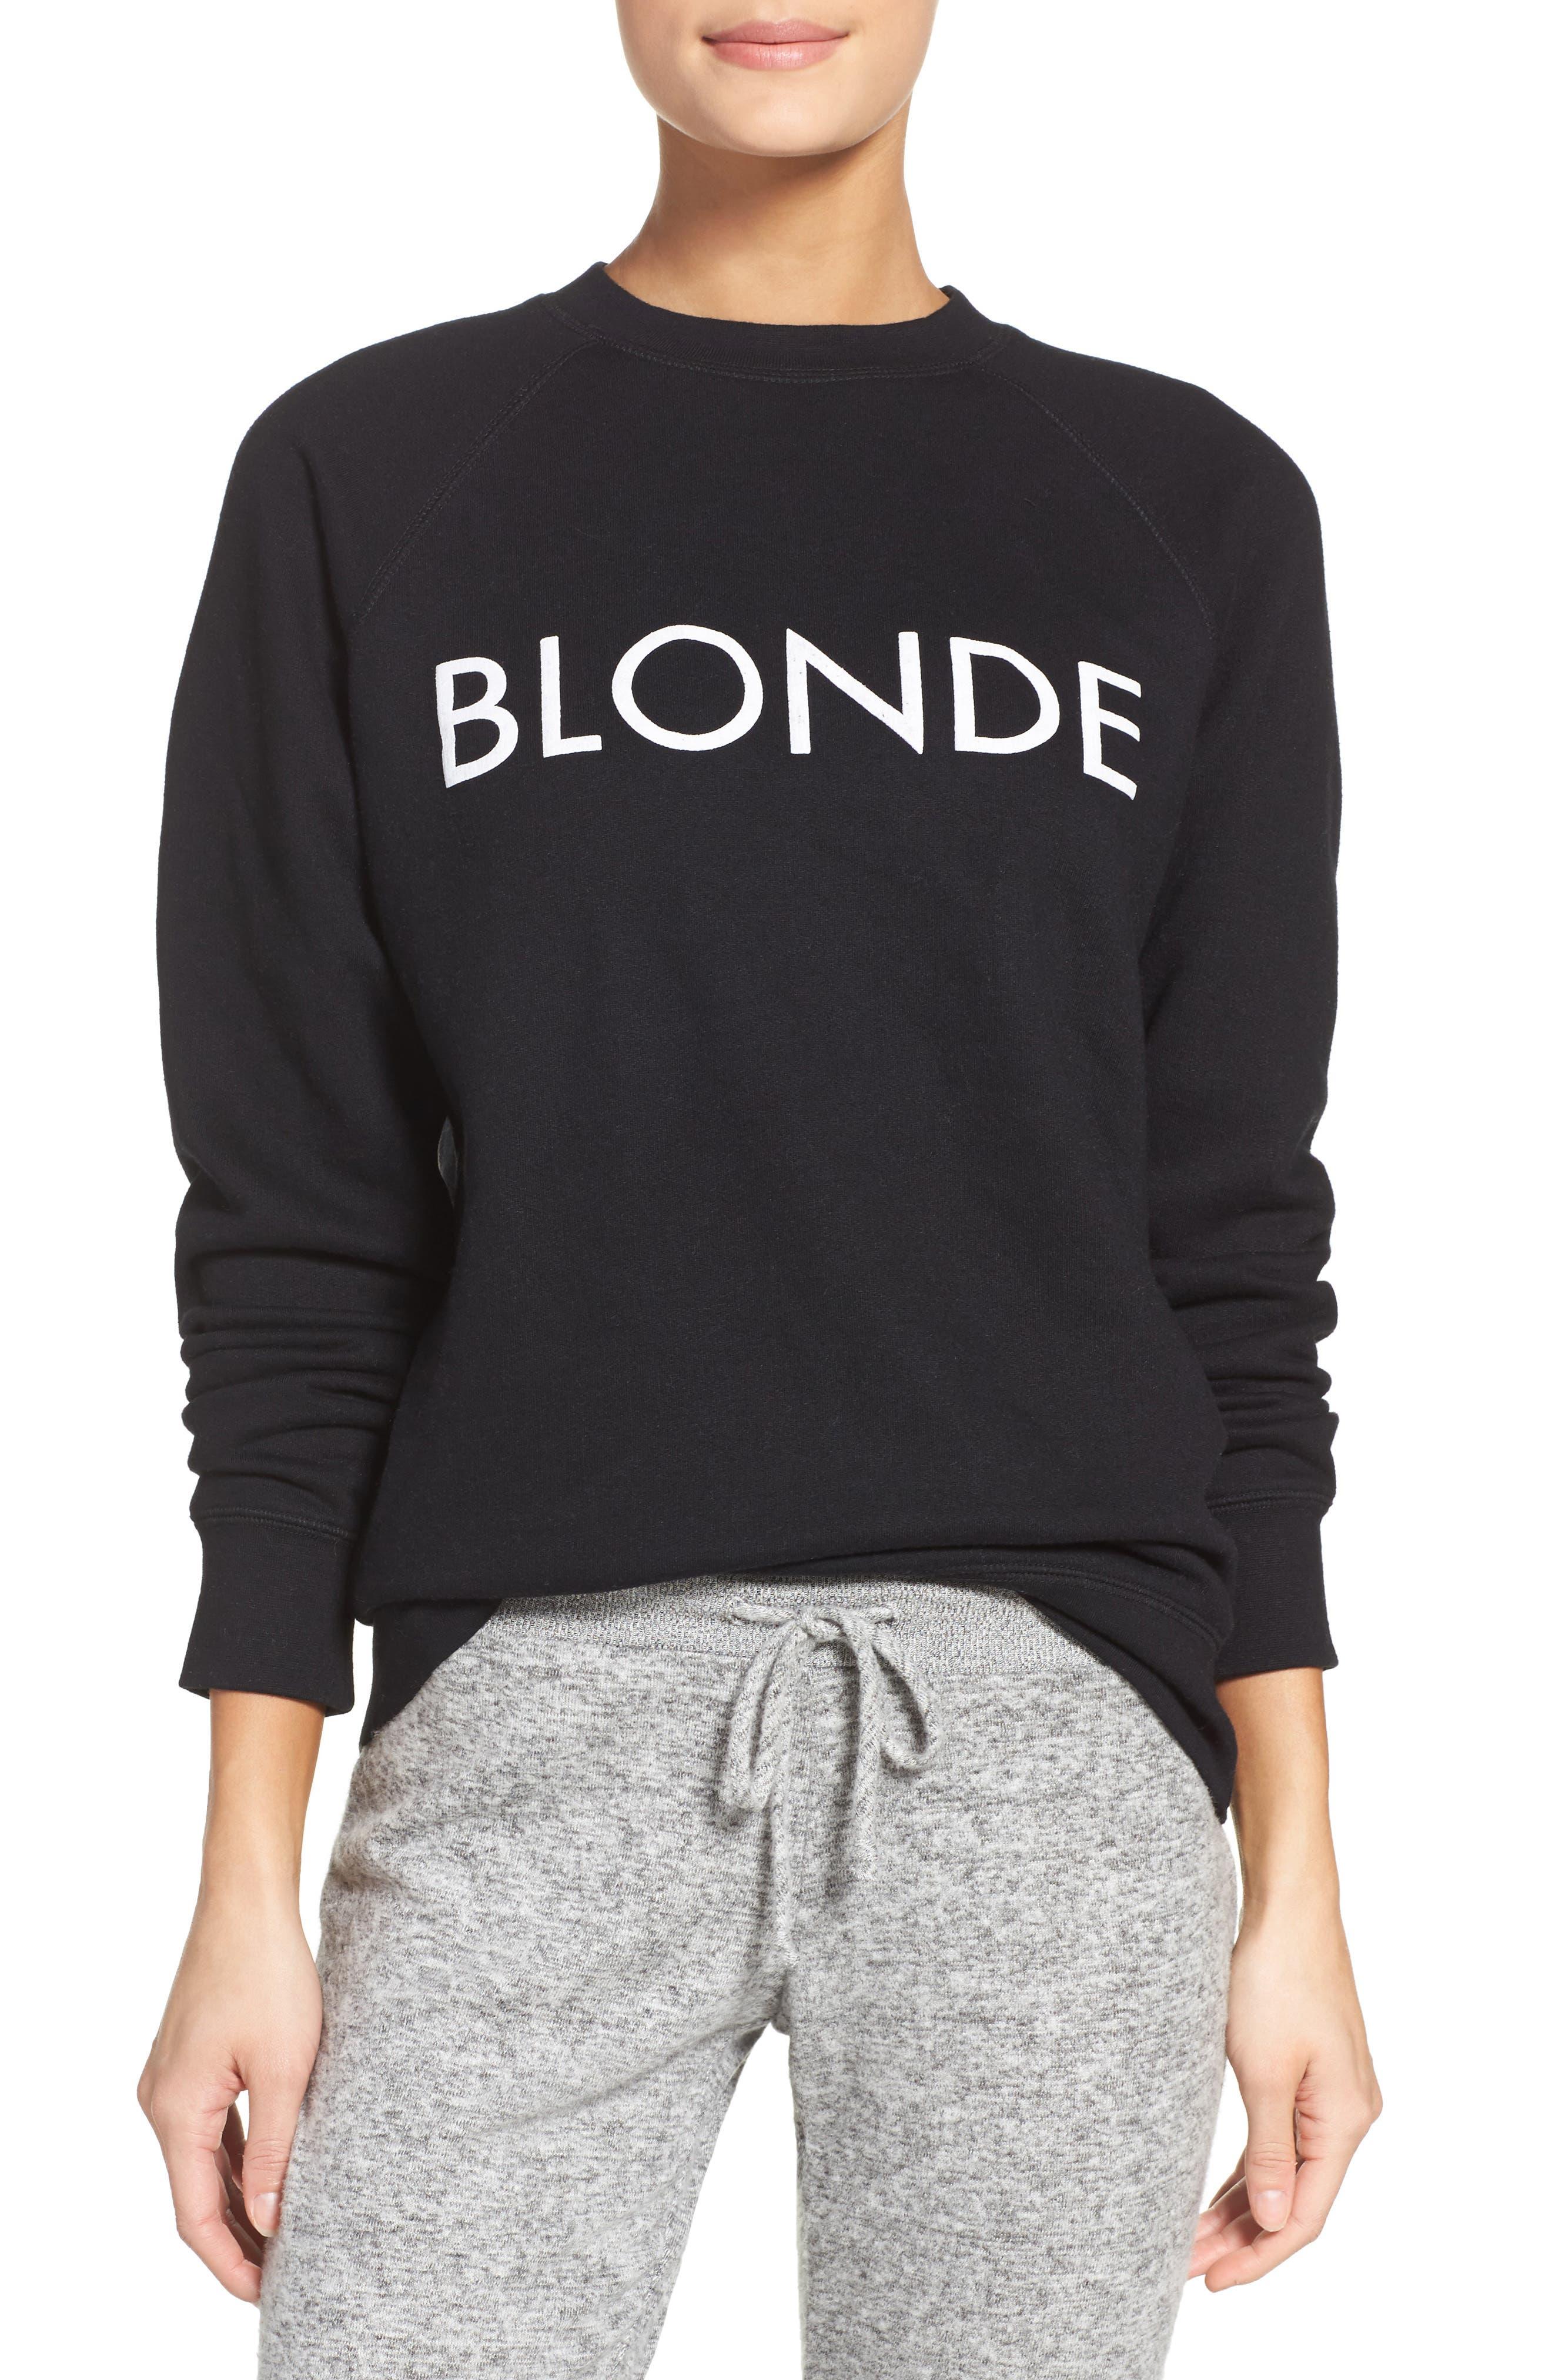 Blonde Crewneck Sweatshirt,                             Main thumbnail 1, color,                             001